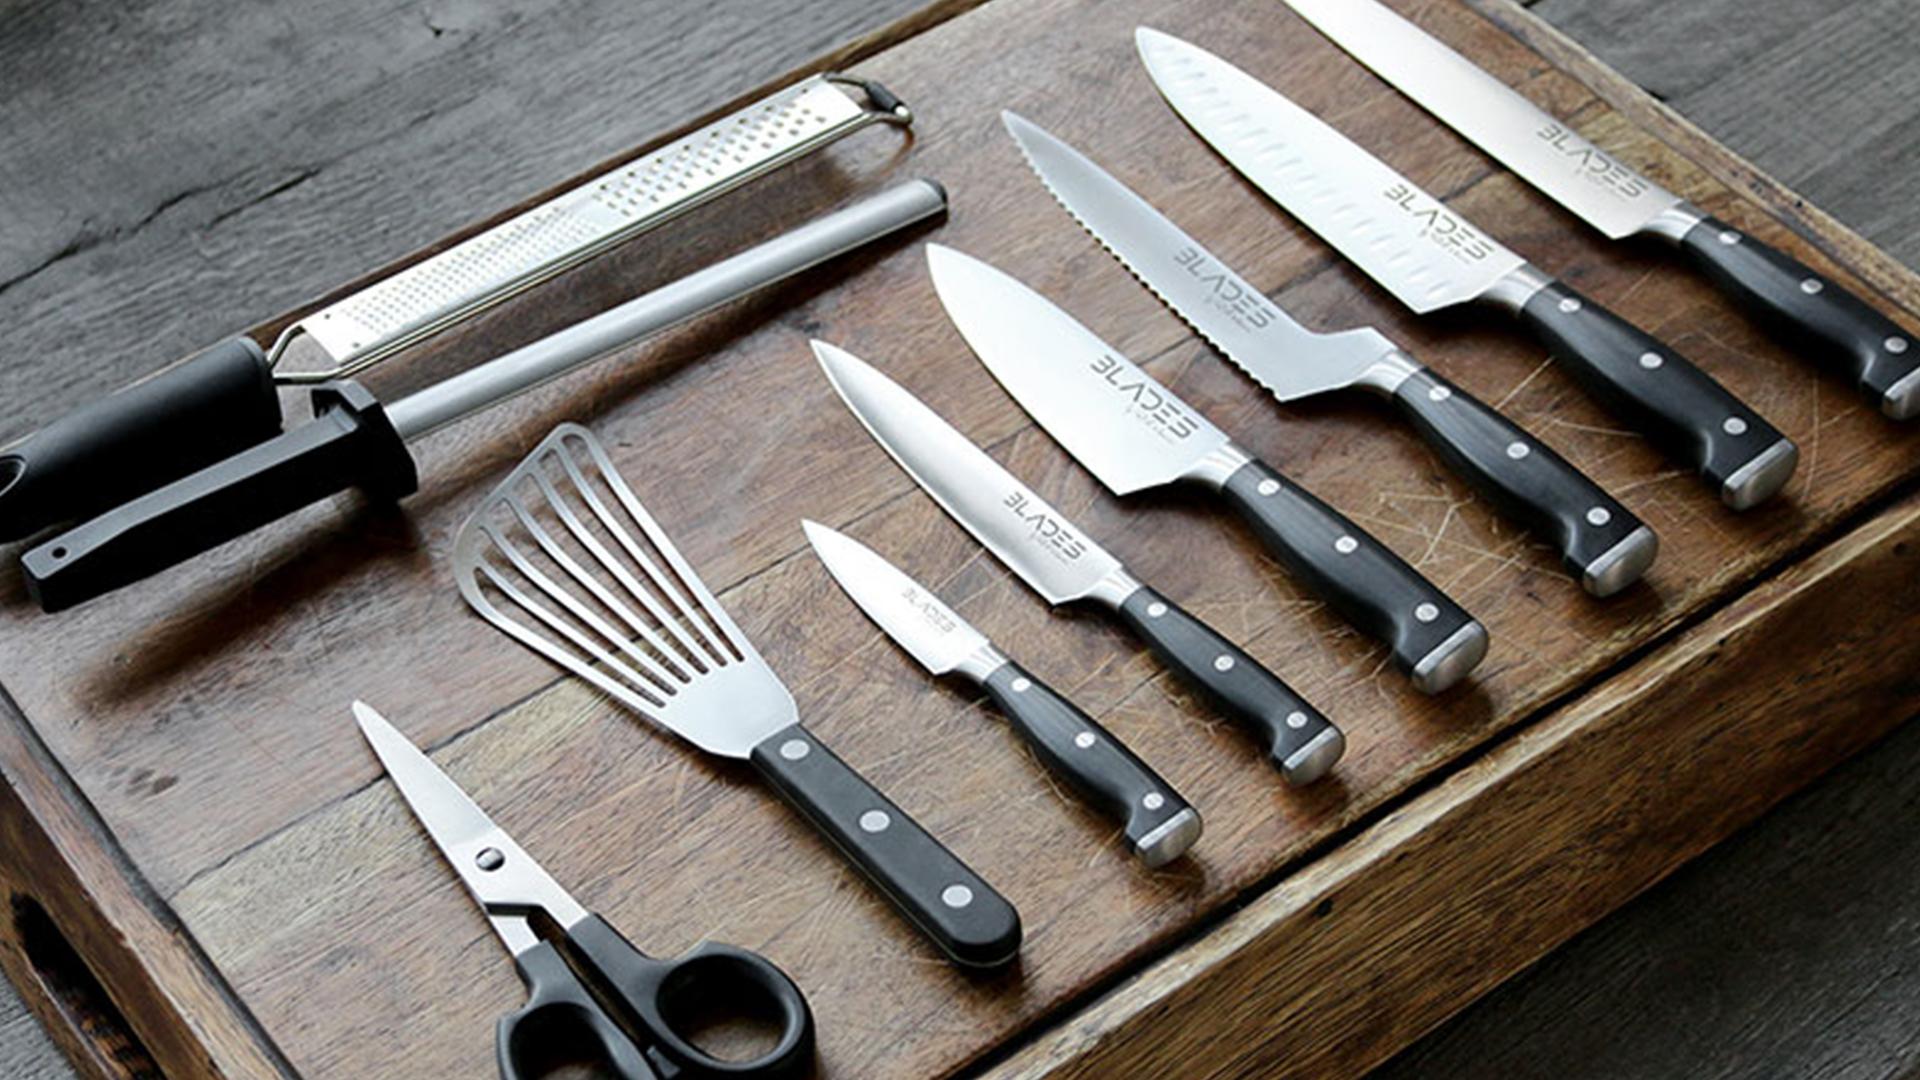 Blades by Rick Moonen - Visit WebsiteWarranty Info